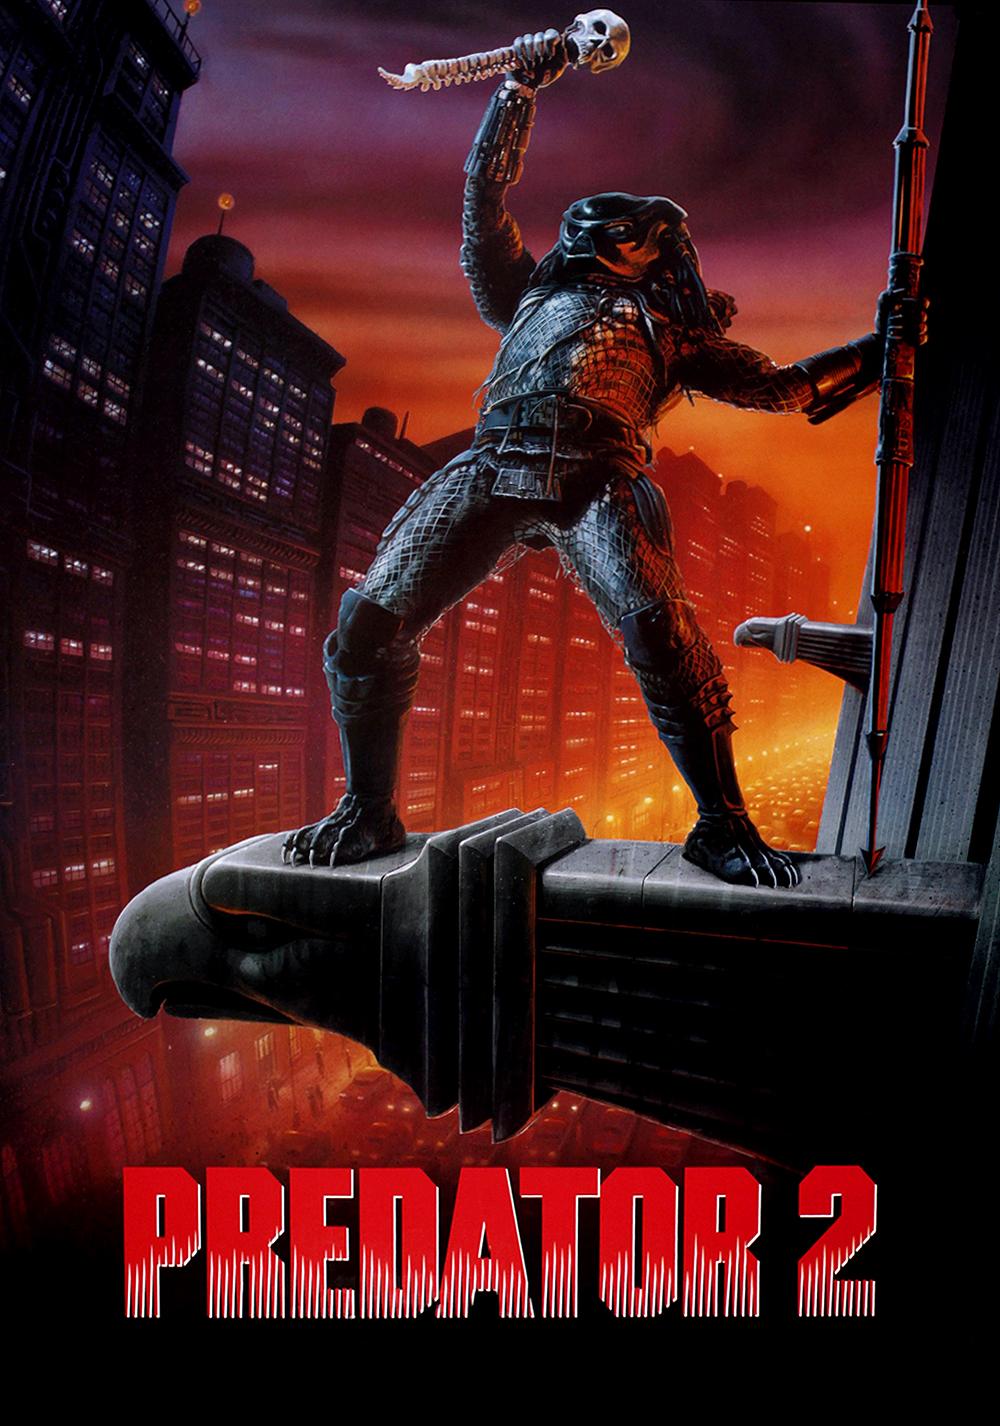 Predator 2 | Movie fanart | fanart.tv